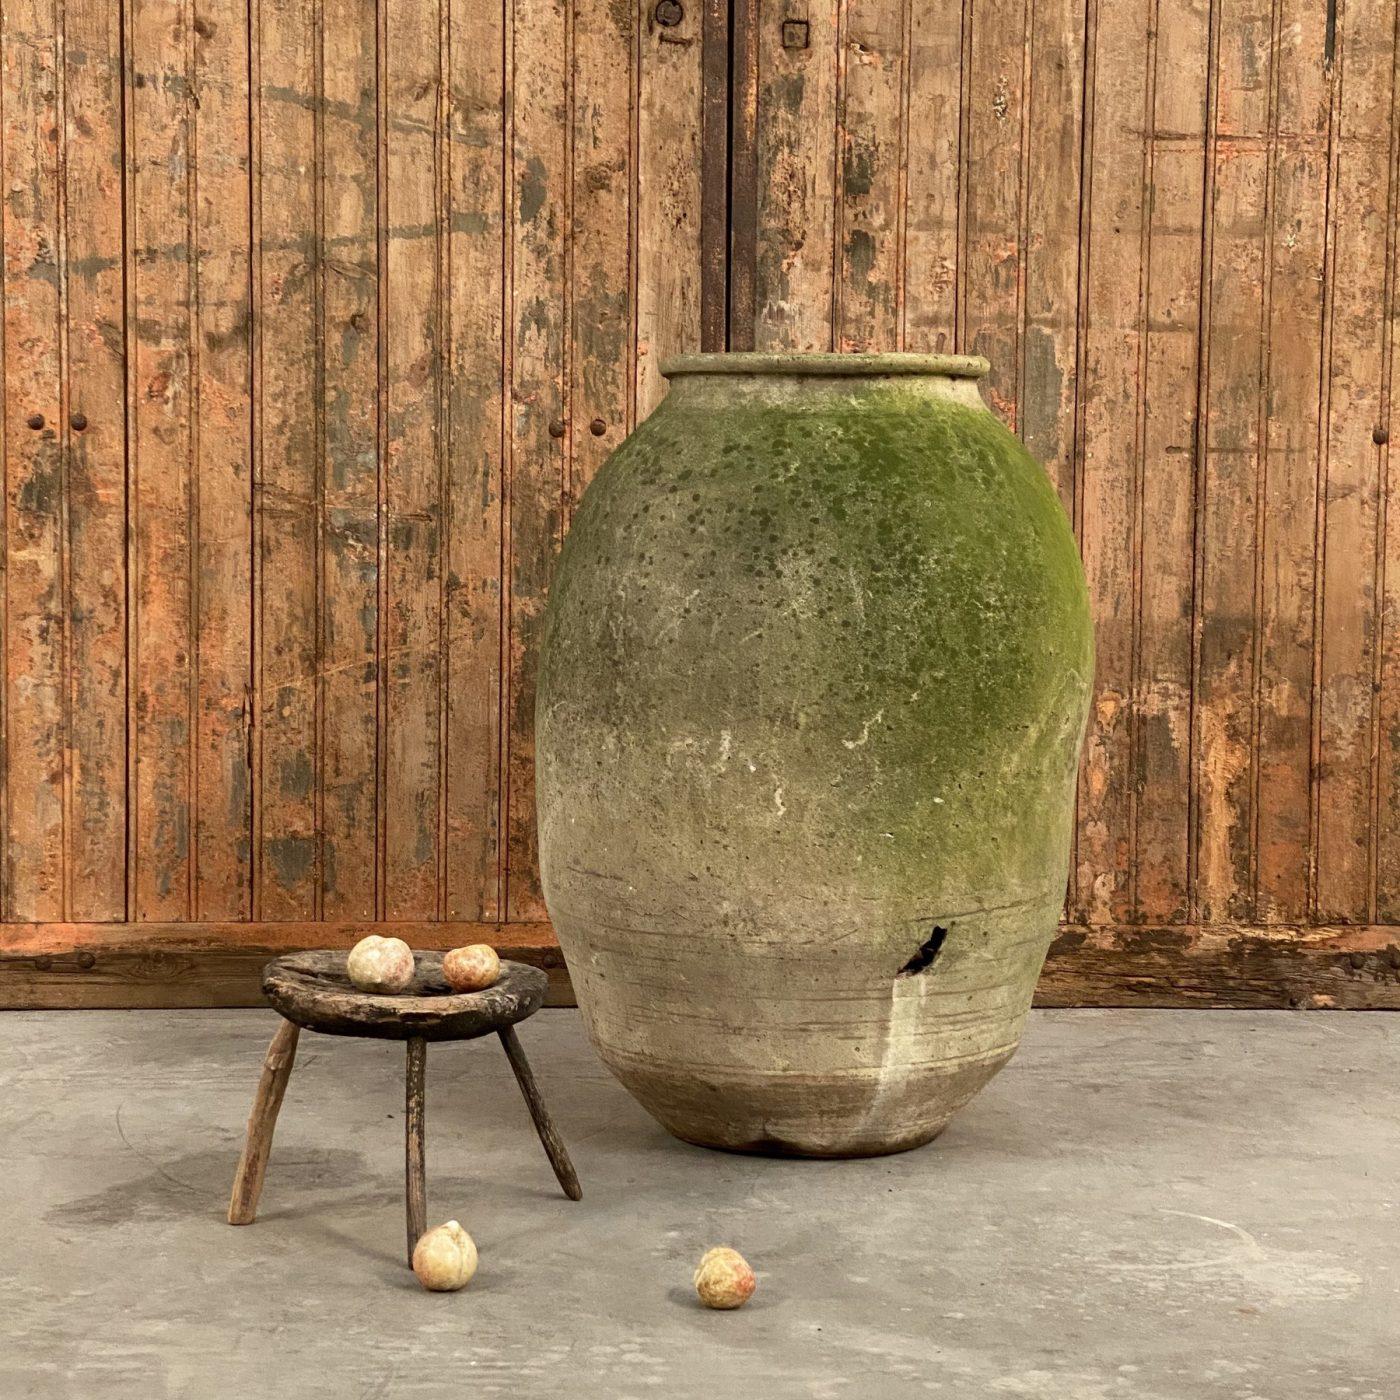 objet-vagabond-terracotta-jar0003